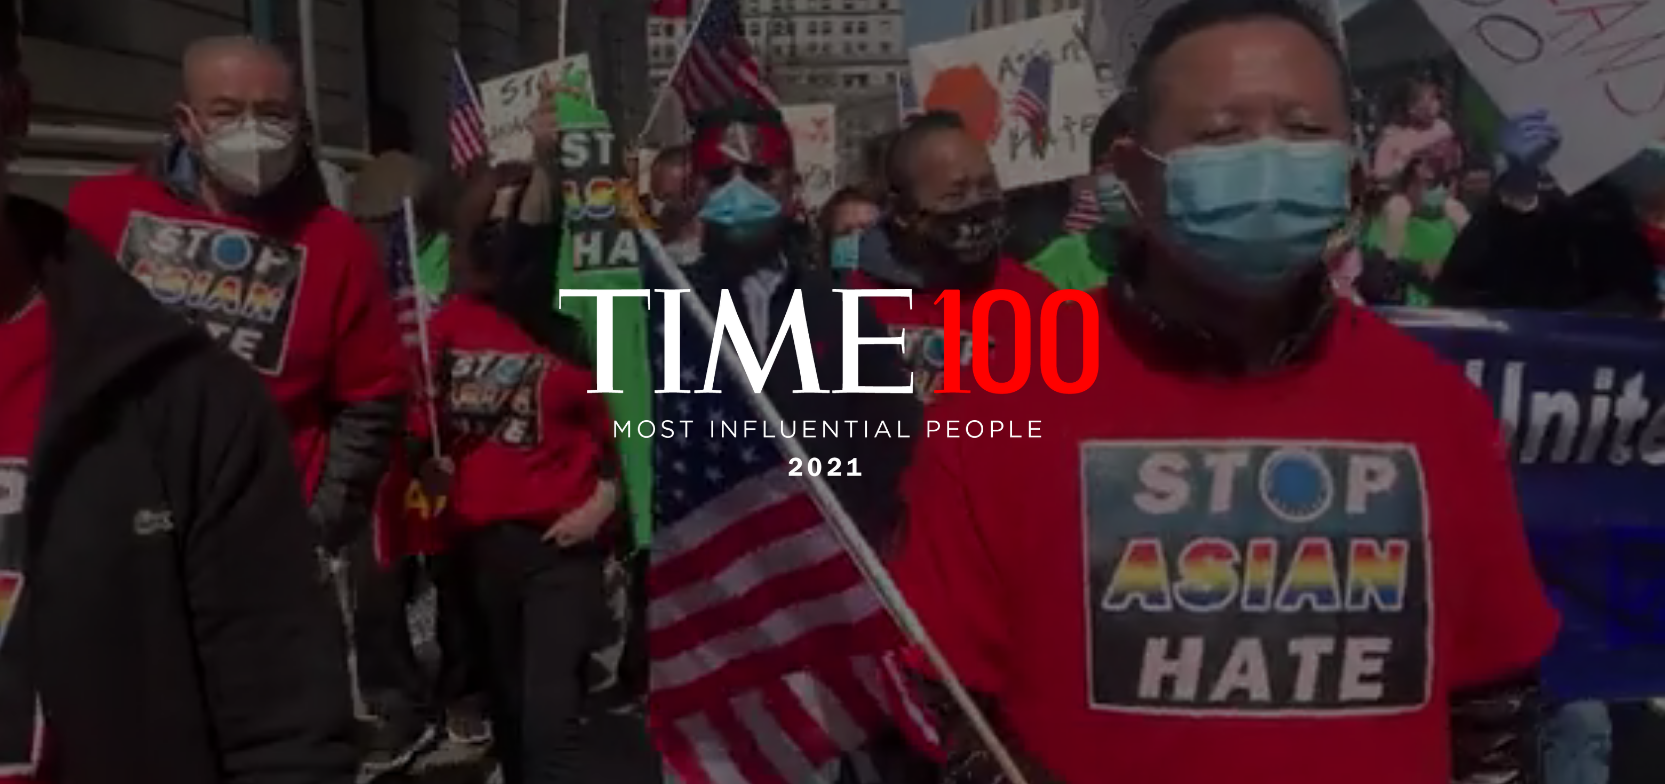 Time 100 -مجلة تايم الامريكية تكشف عن أكثر الشخصيات المؤثرة في 2021